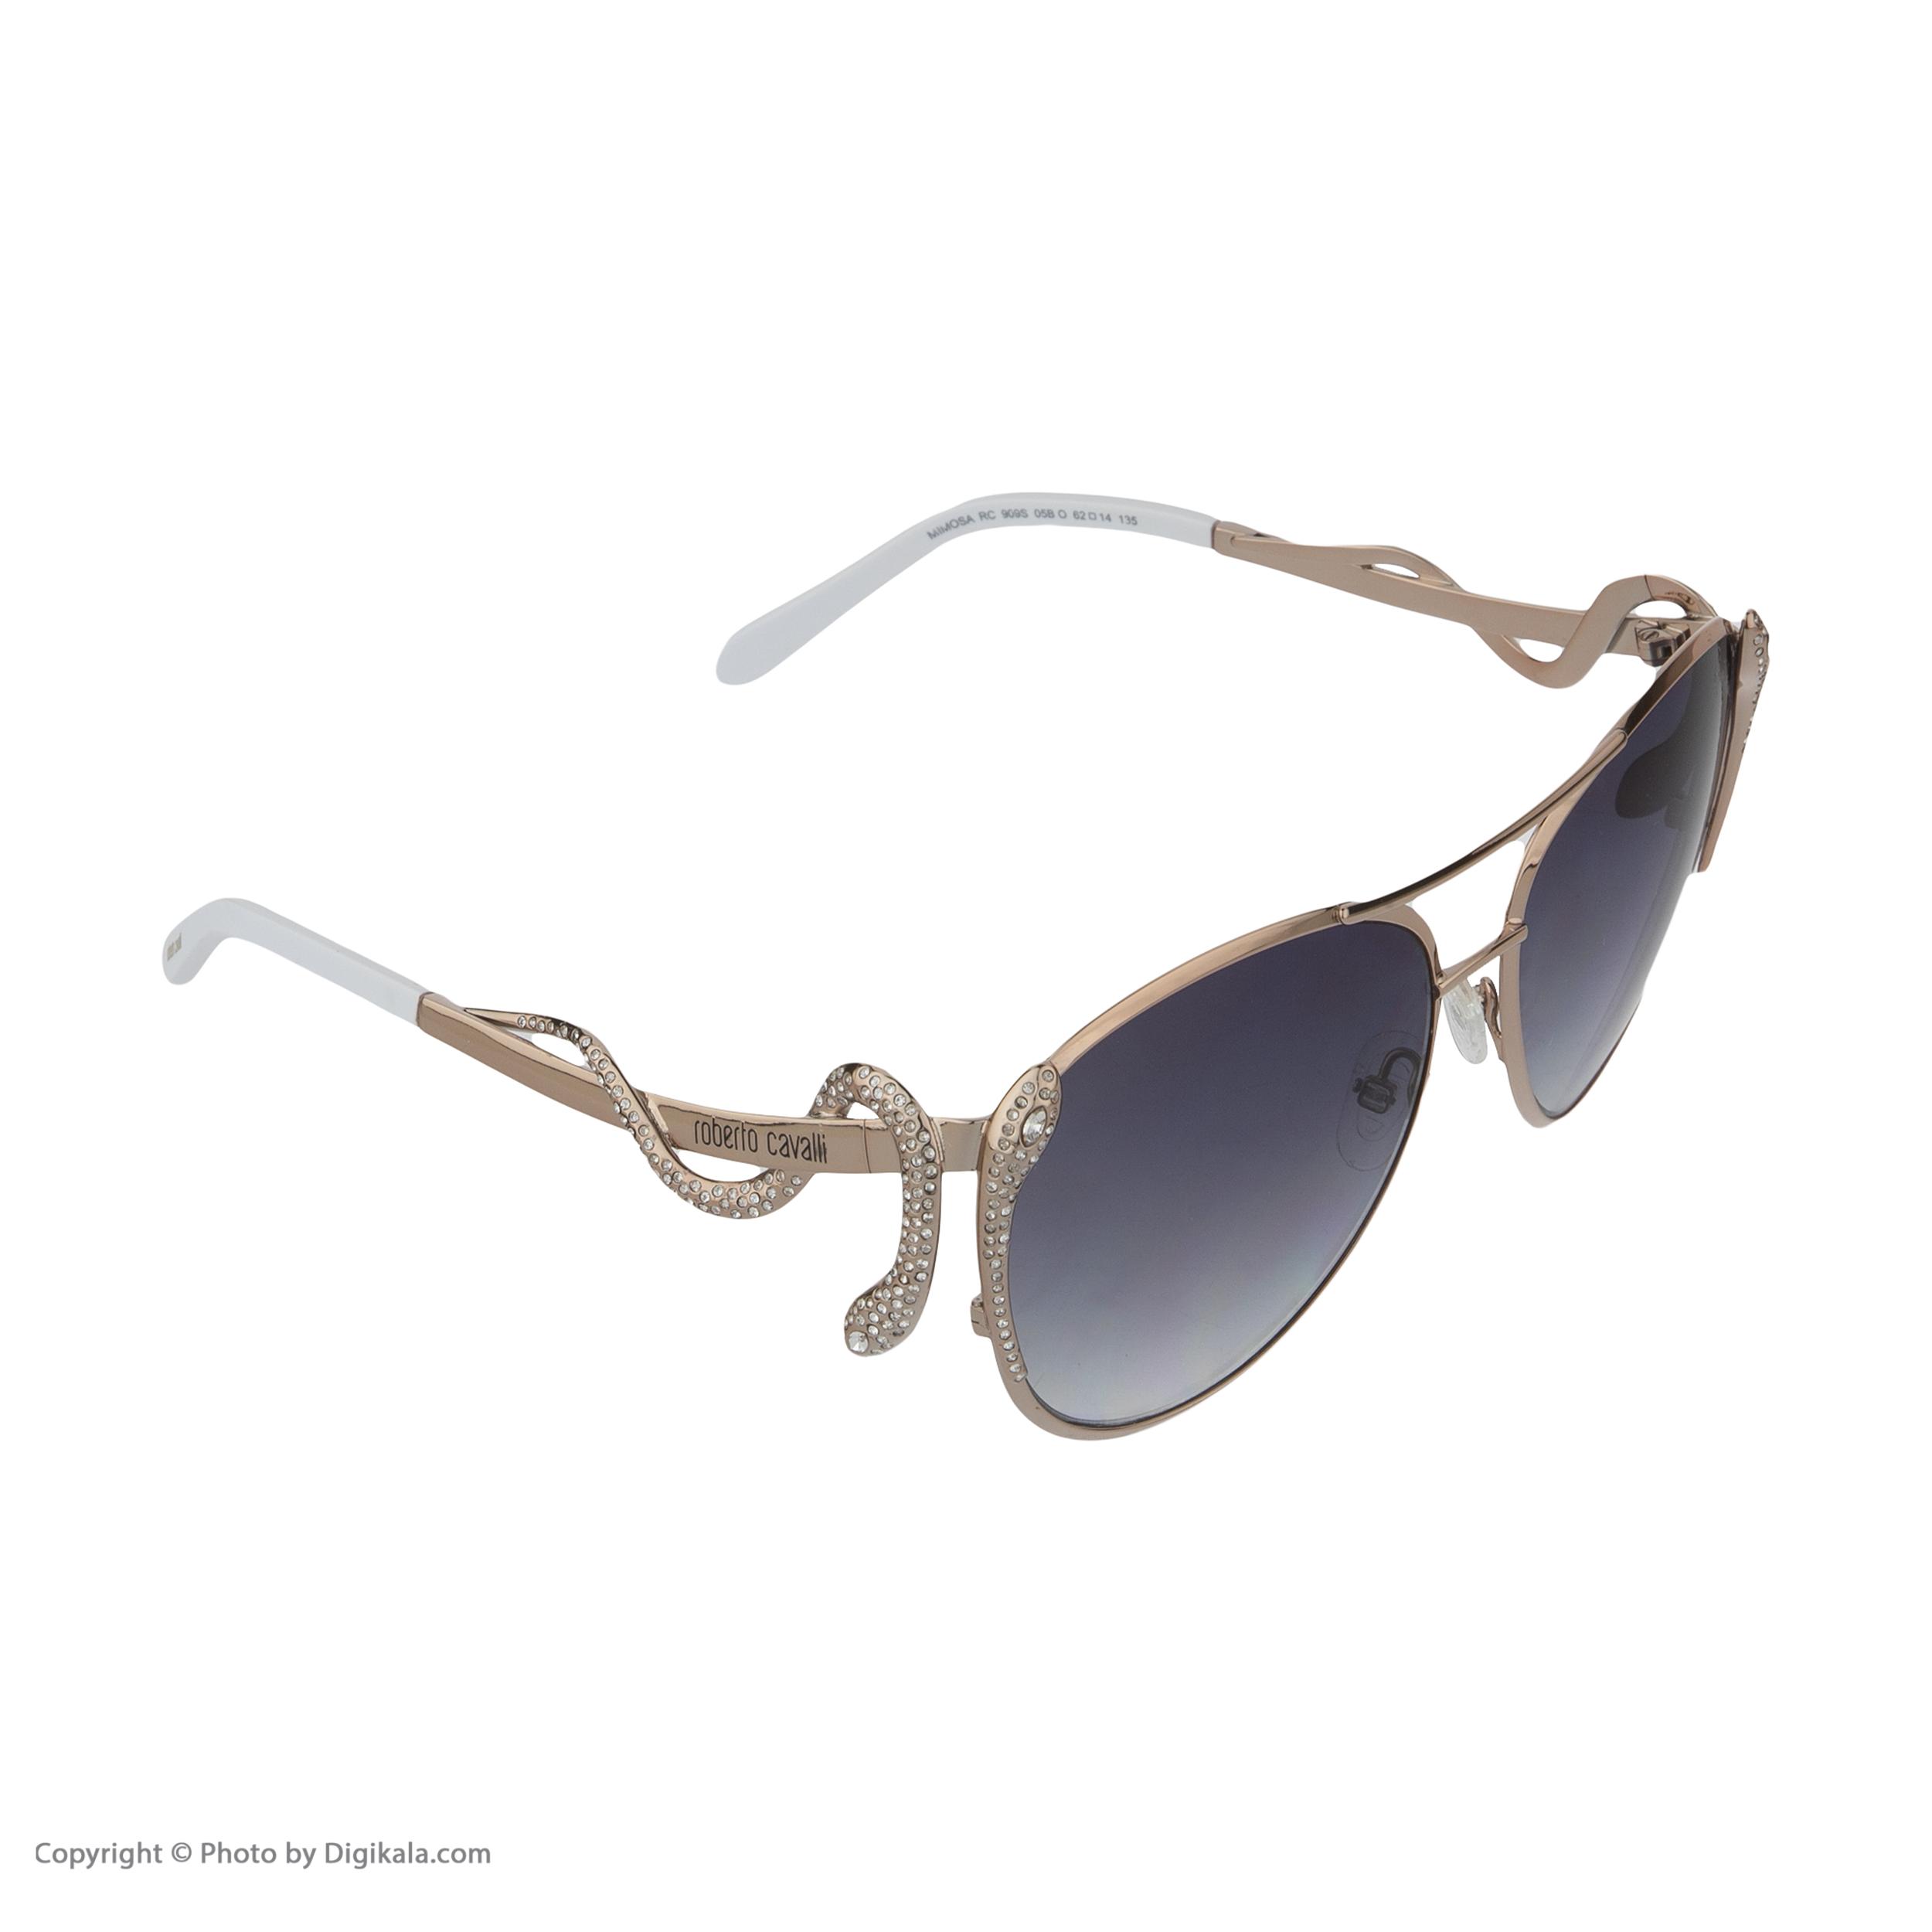 عینک آفتابی زنانه روبرتو کاوالی مدل 909 -  - 6